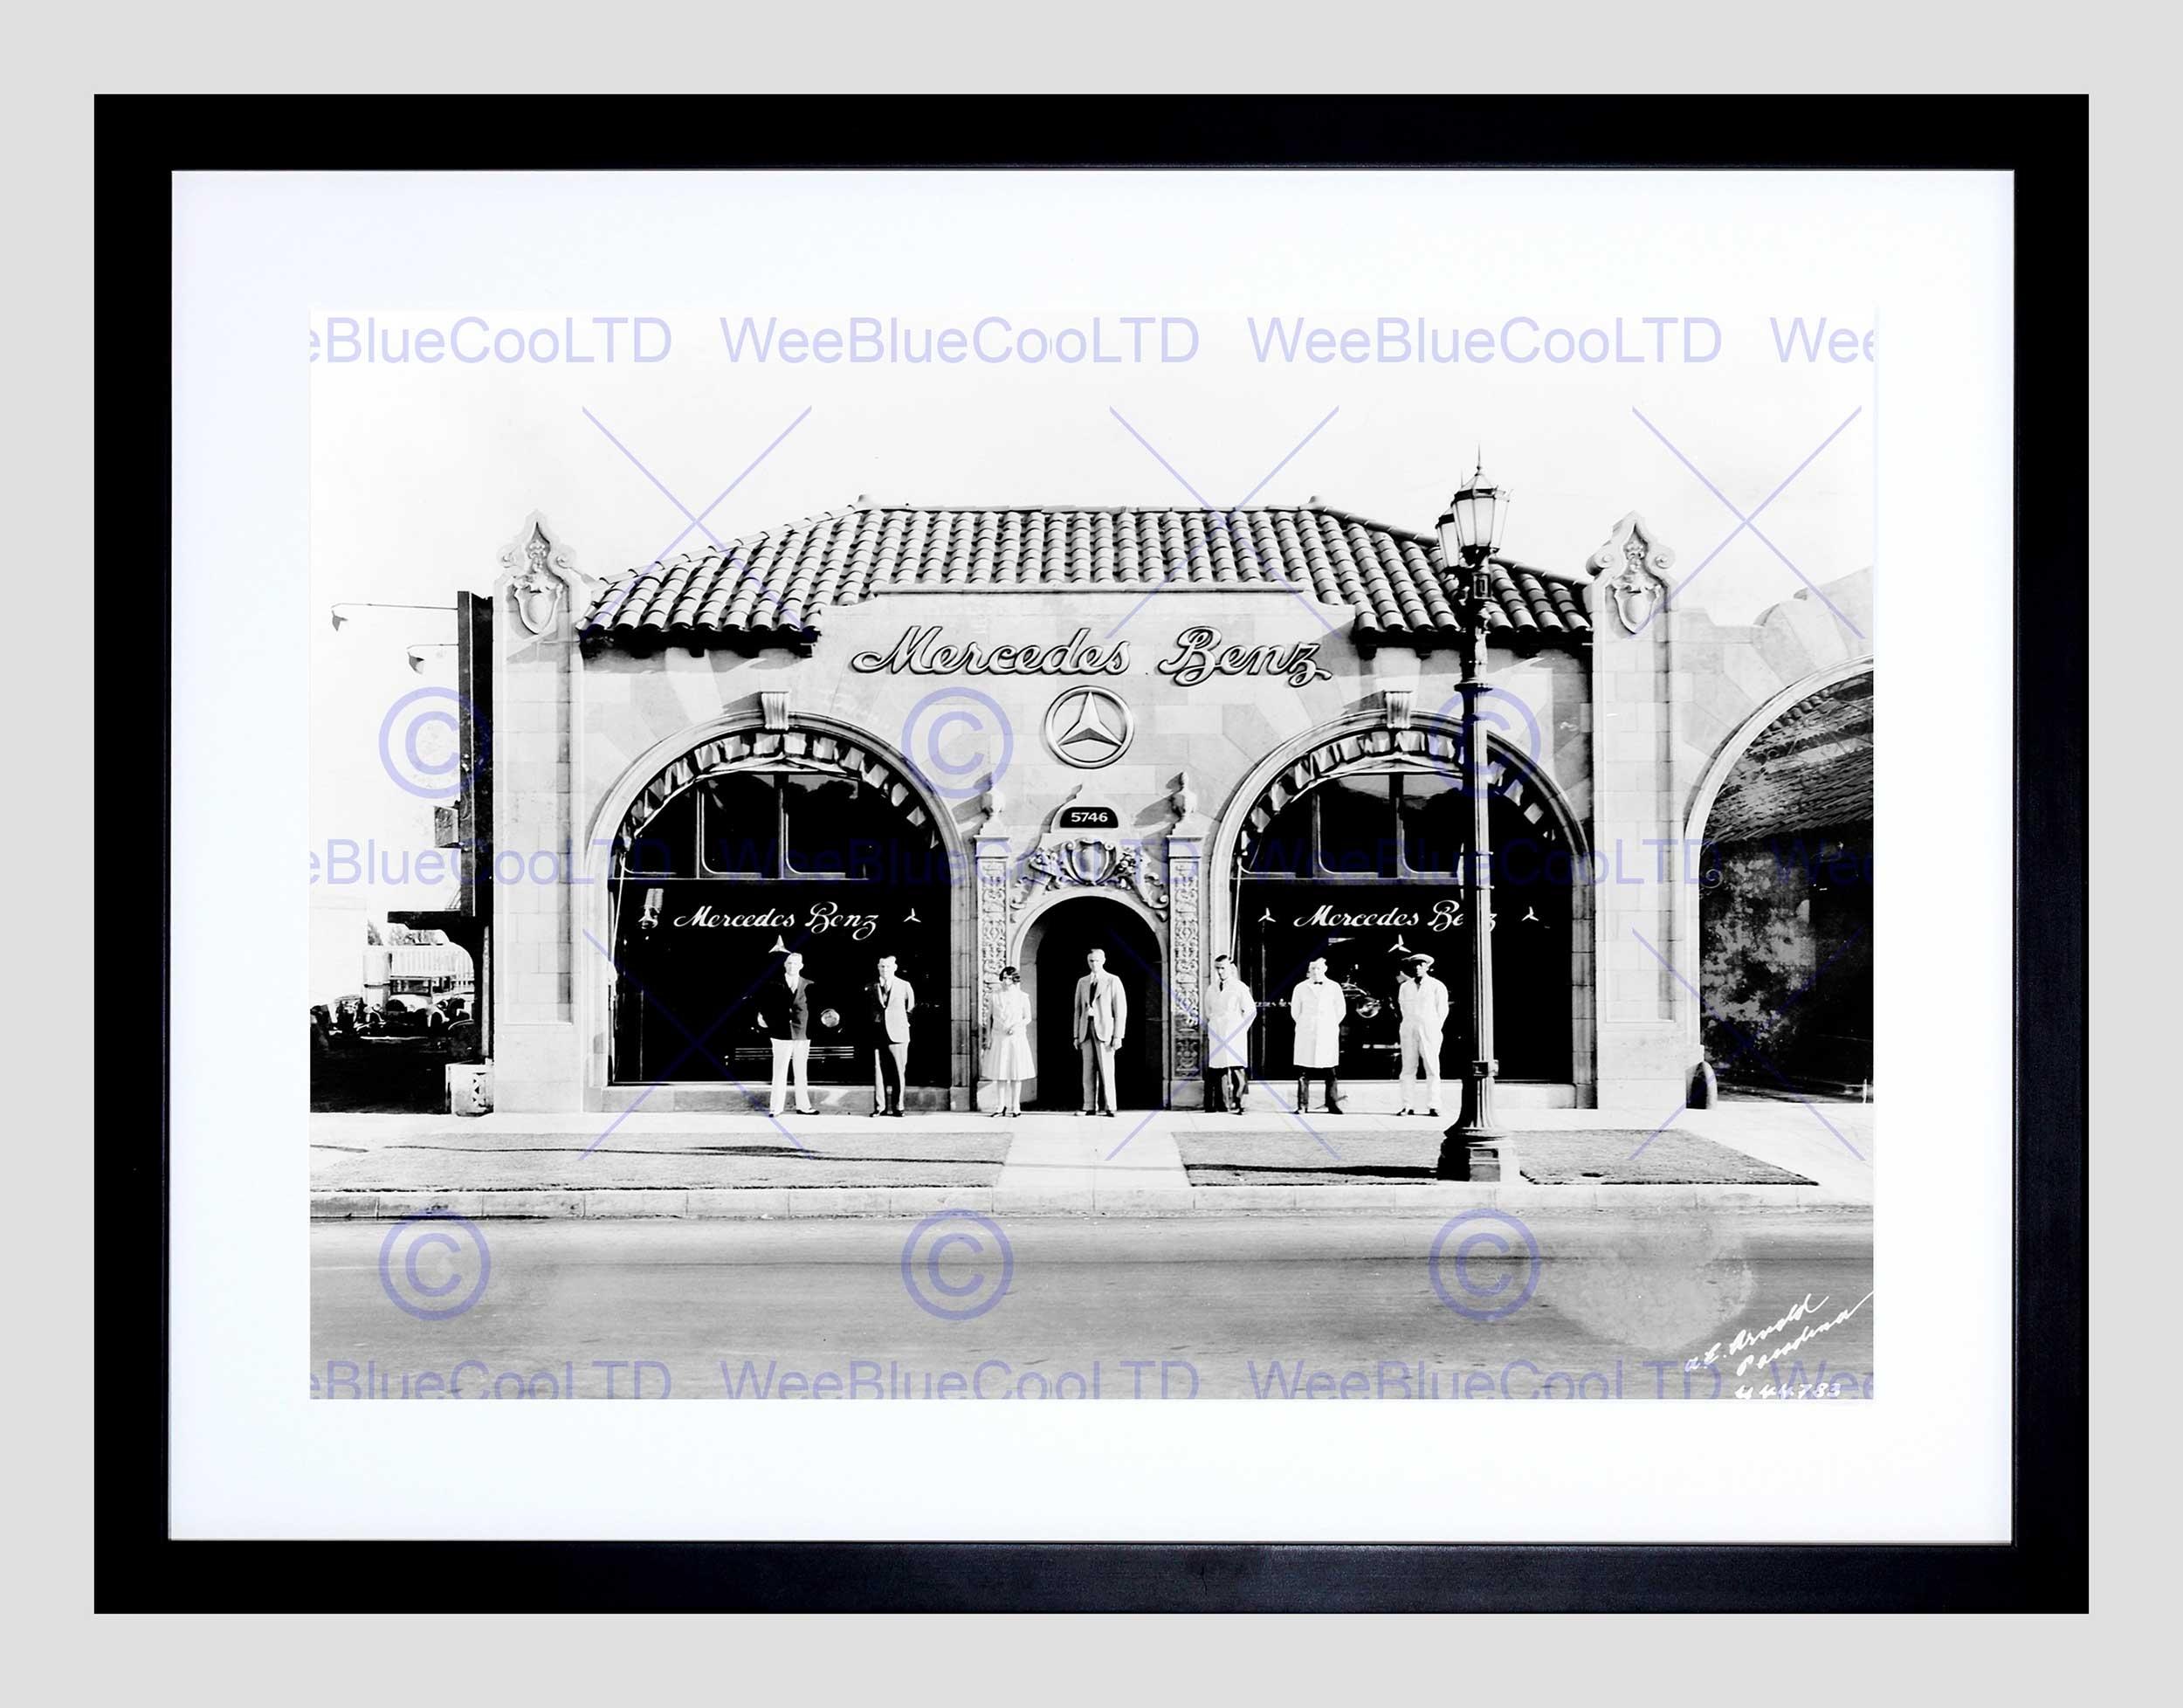 Vintage Car Automobile Sale Shop Pasadena Los Angeles Framed Art Regarding 2018 Los Angeles Framed Art Prints (Gallery 2 of 15)